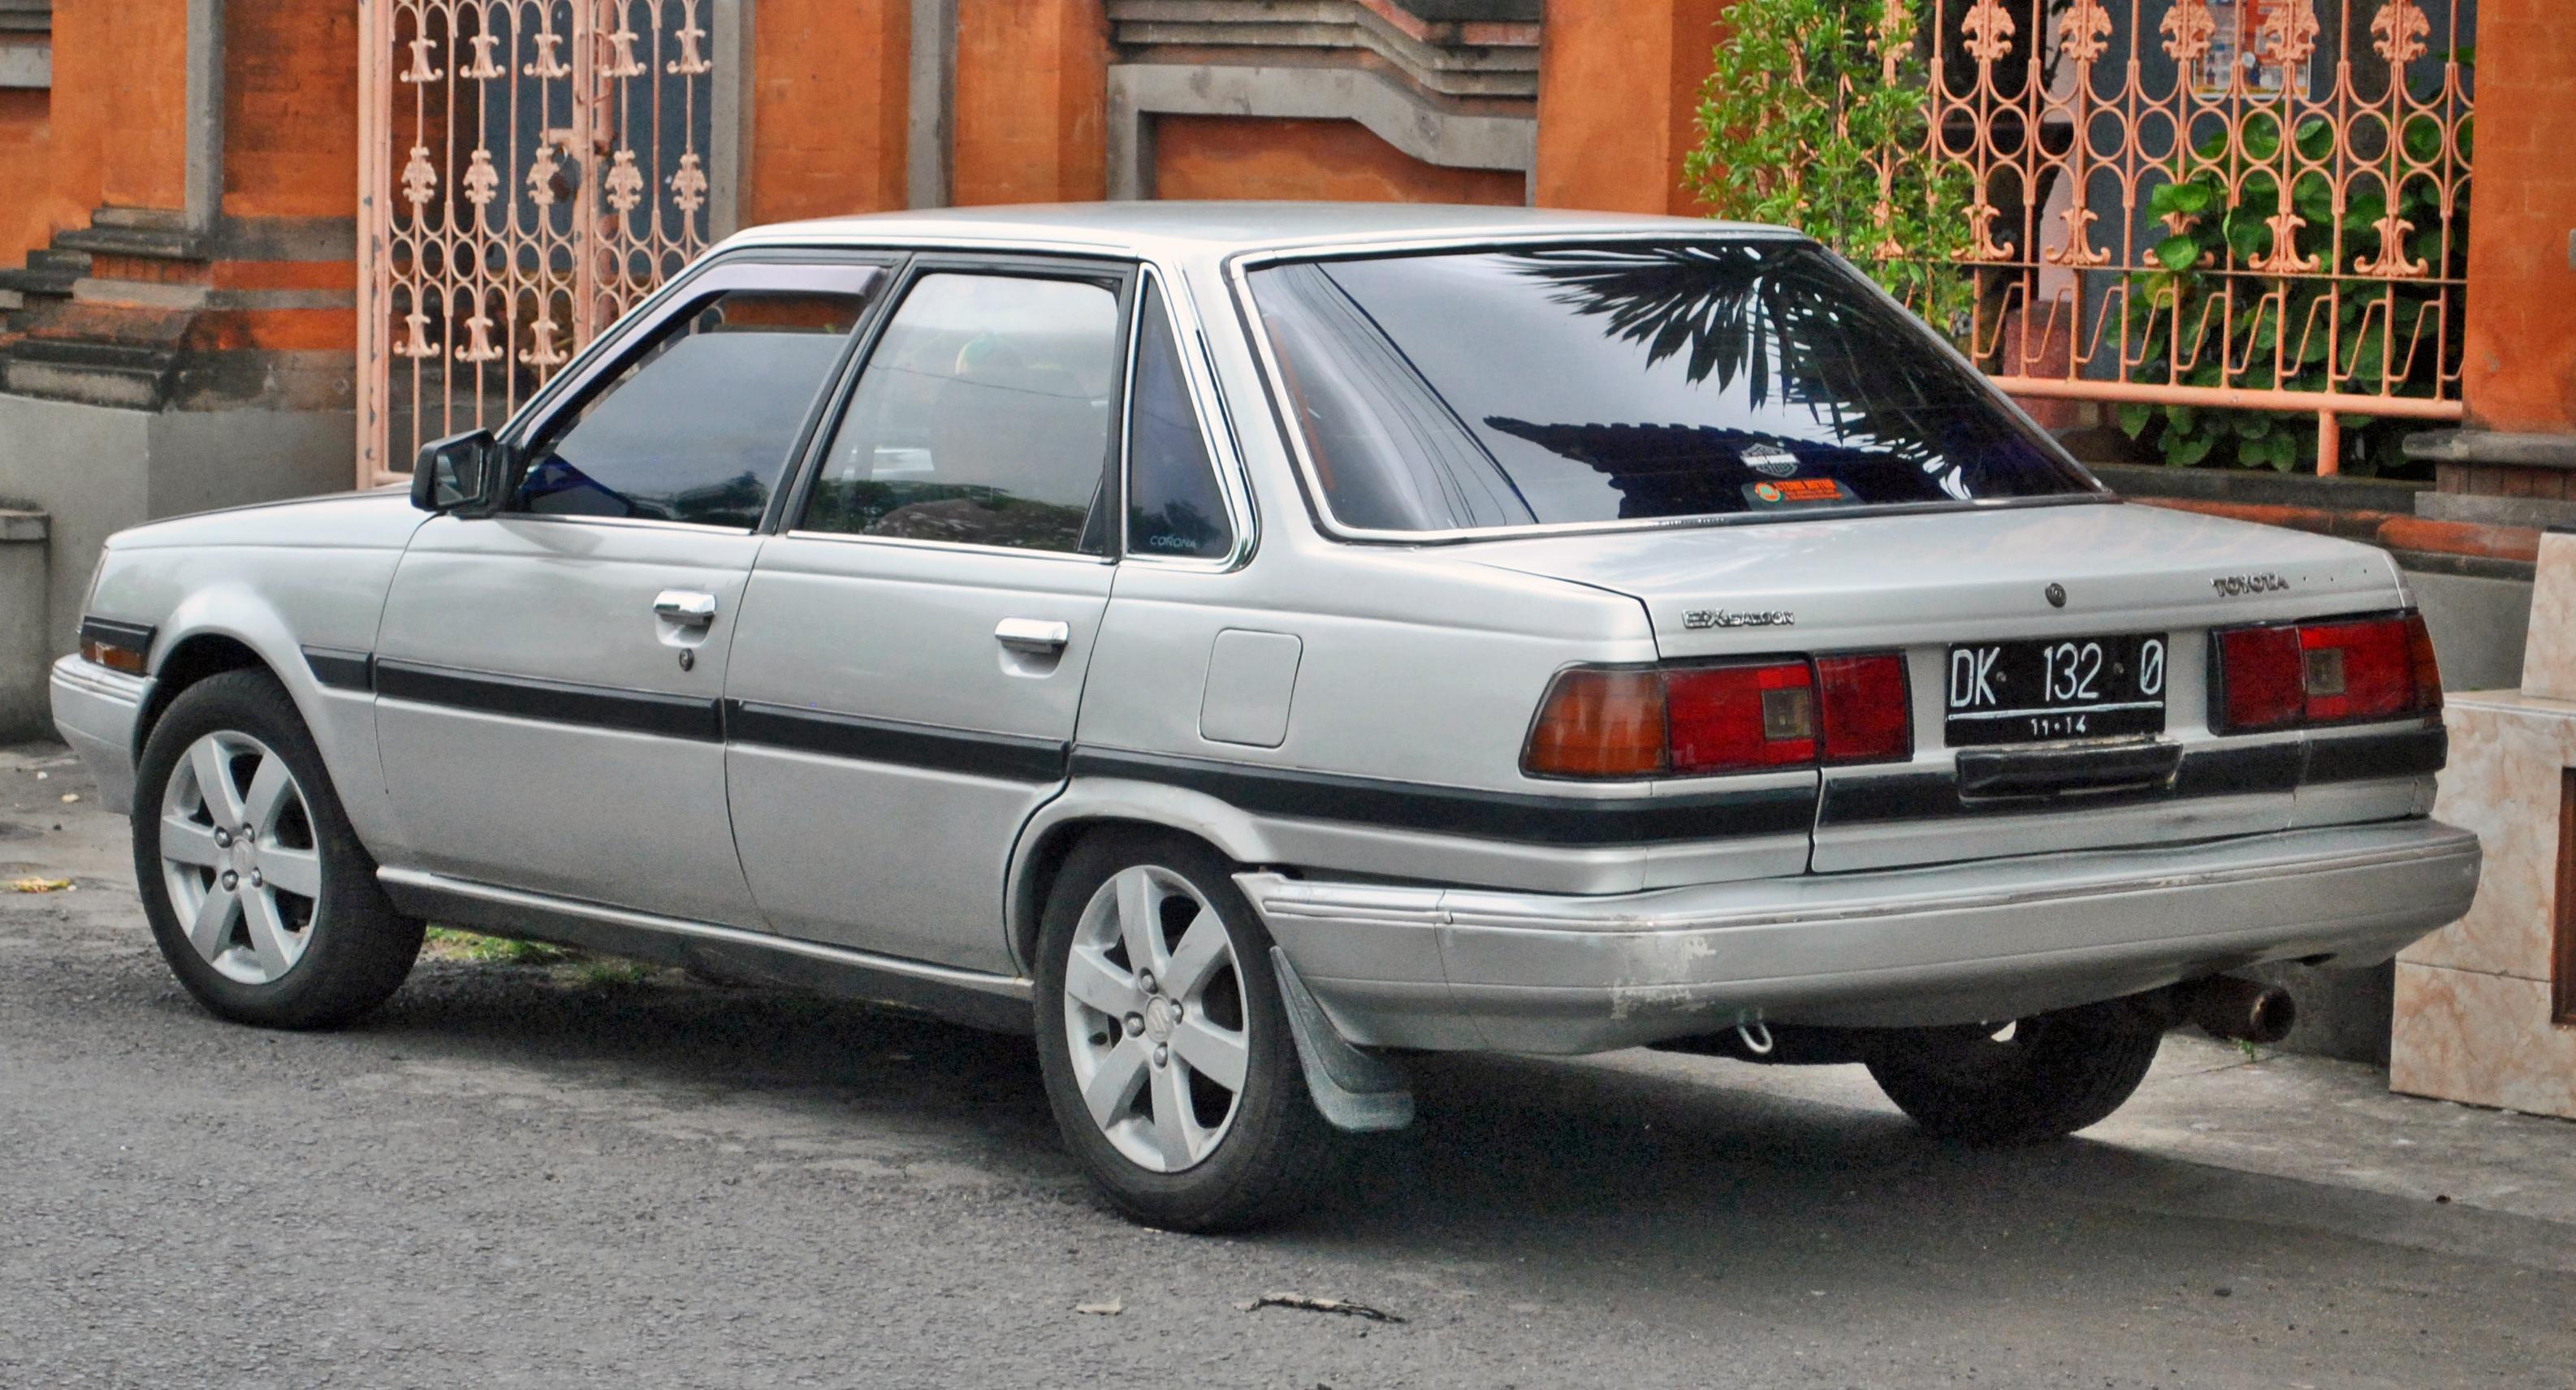 Toyota Carina IV (T150) 1983 - 1988 Sedan #5